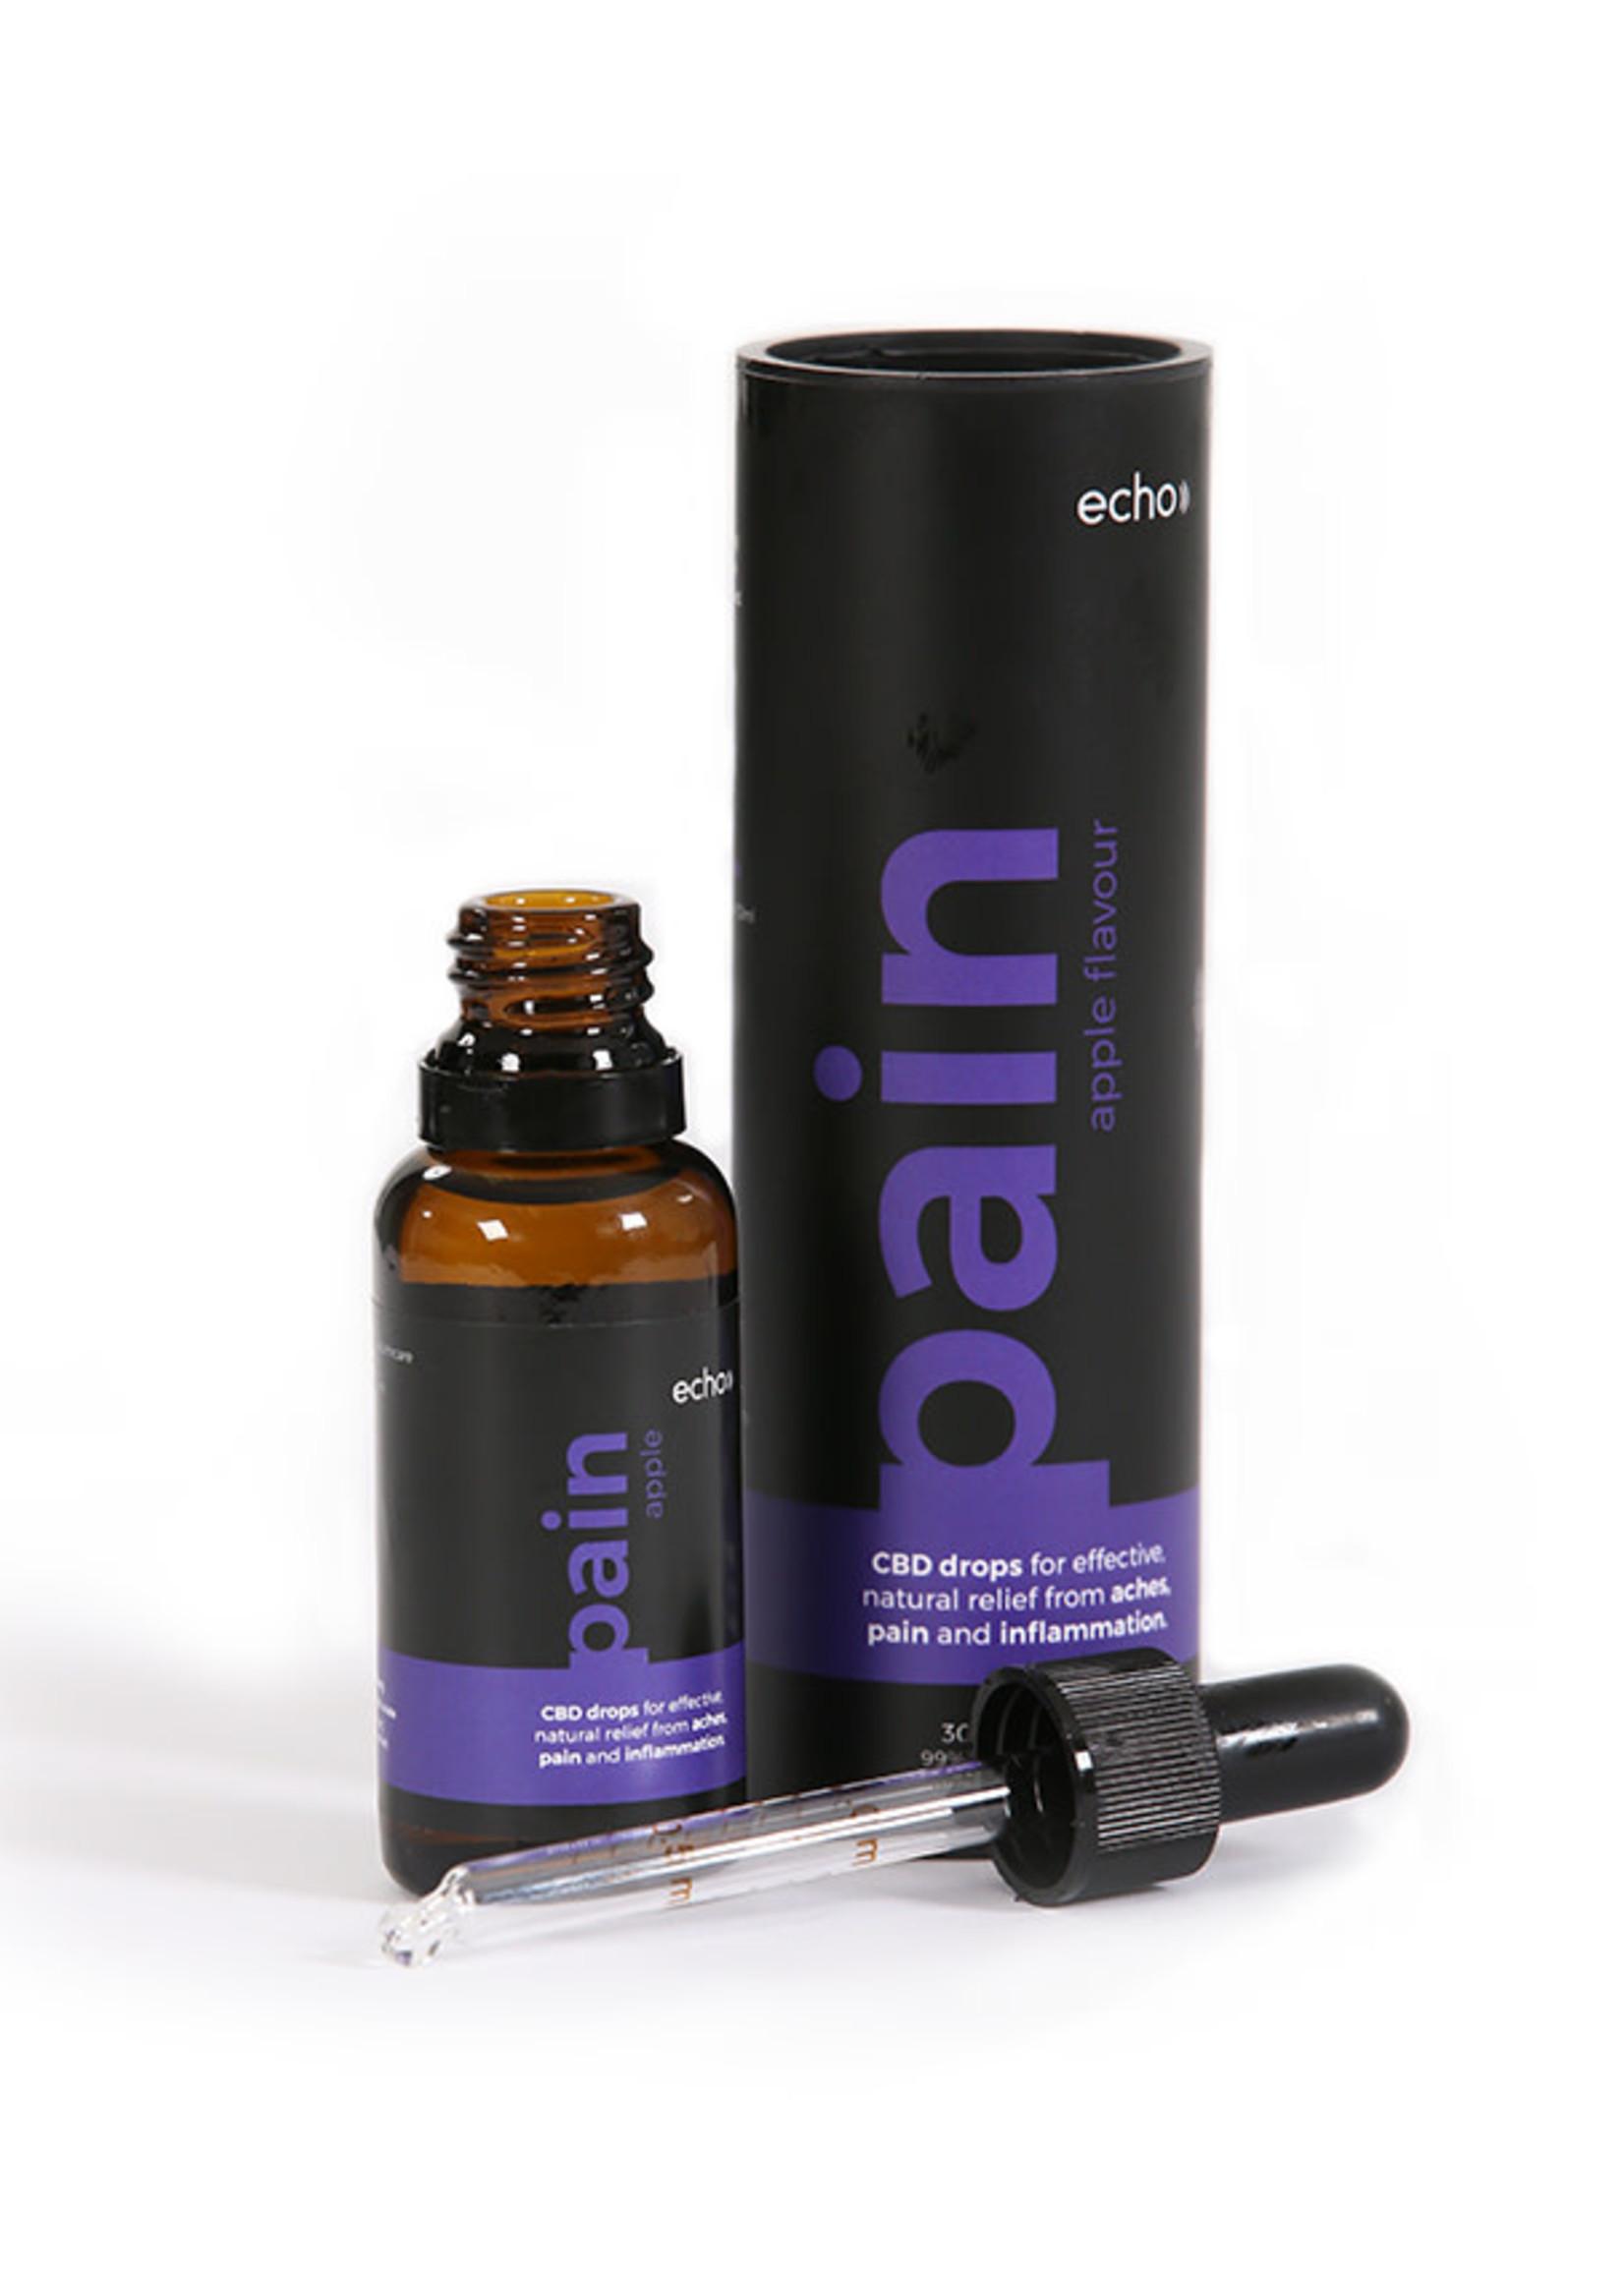 Echo CBD oil - pain